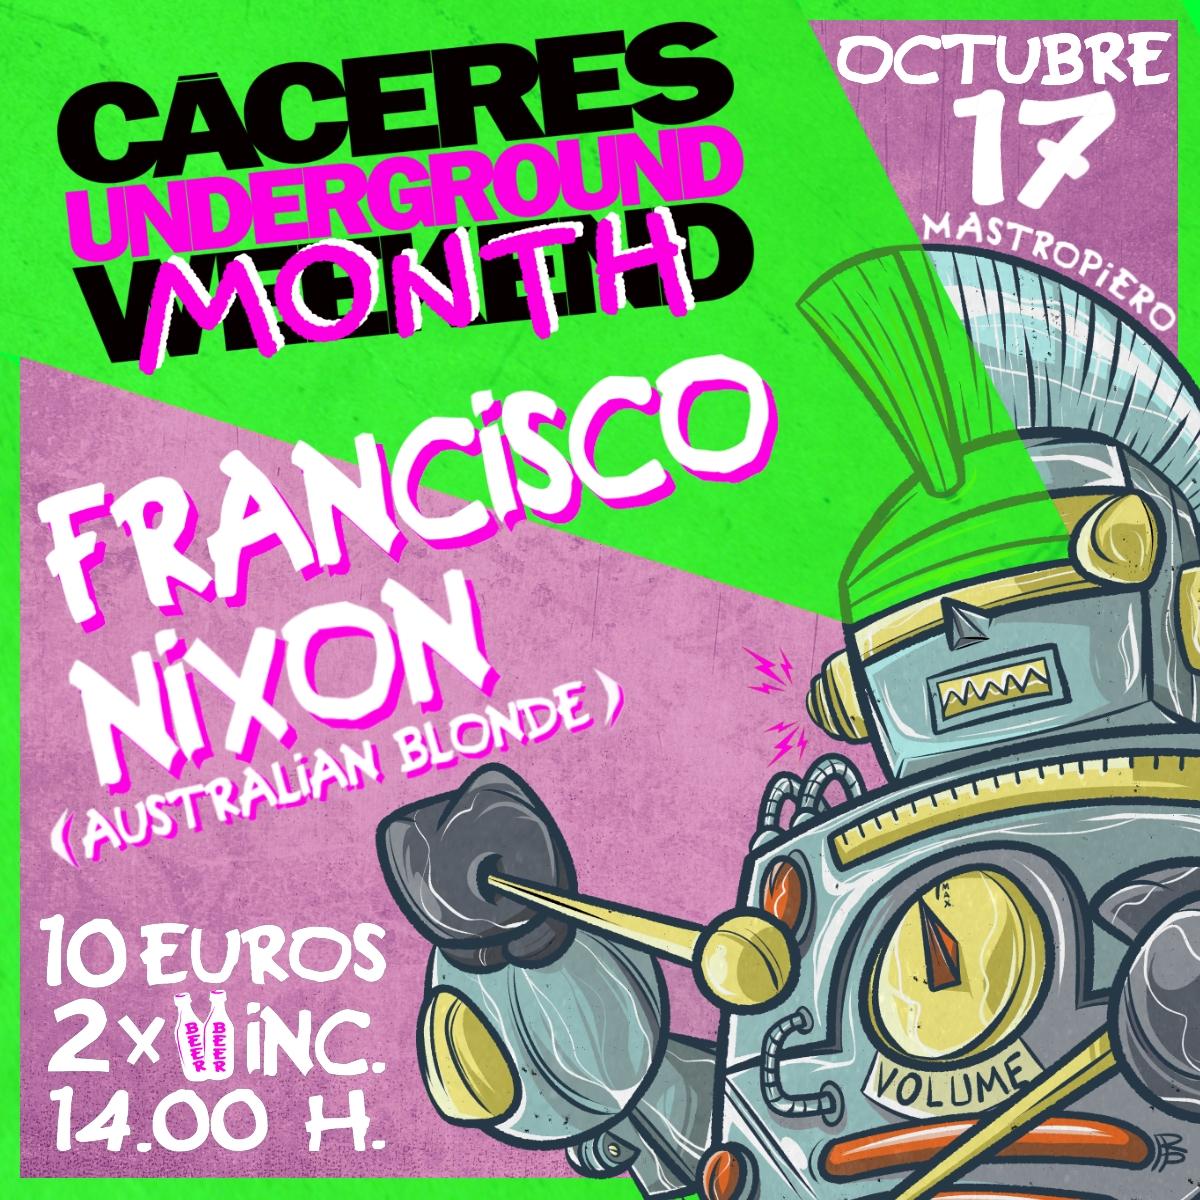 francisco nixon en caceres 1631299837821198